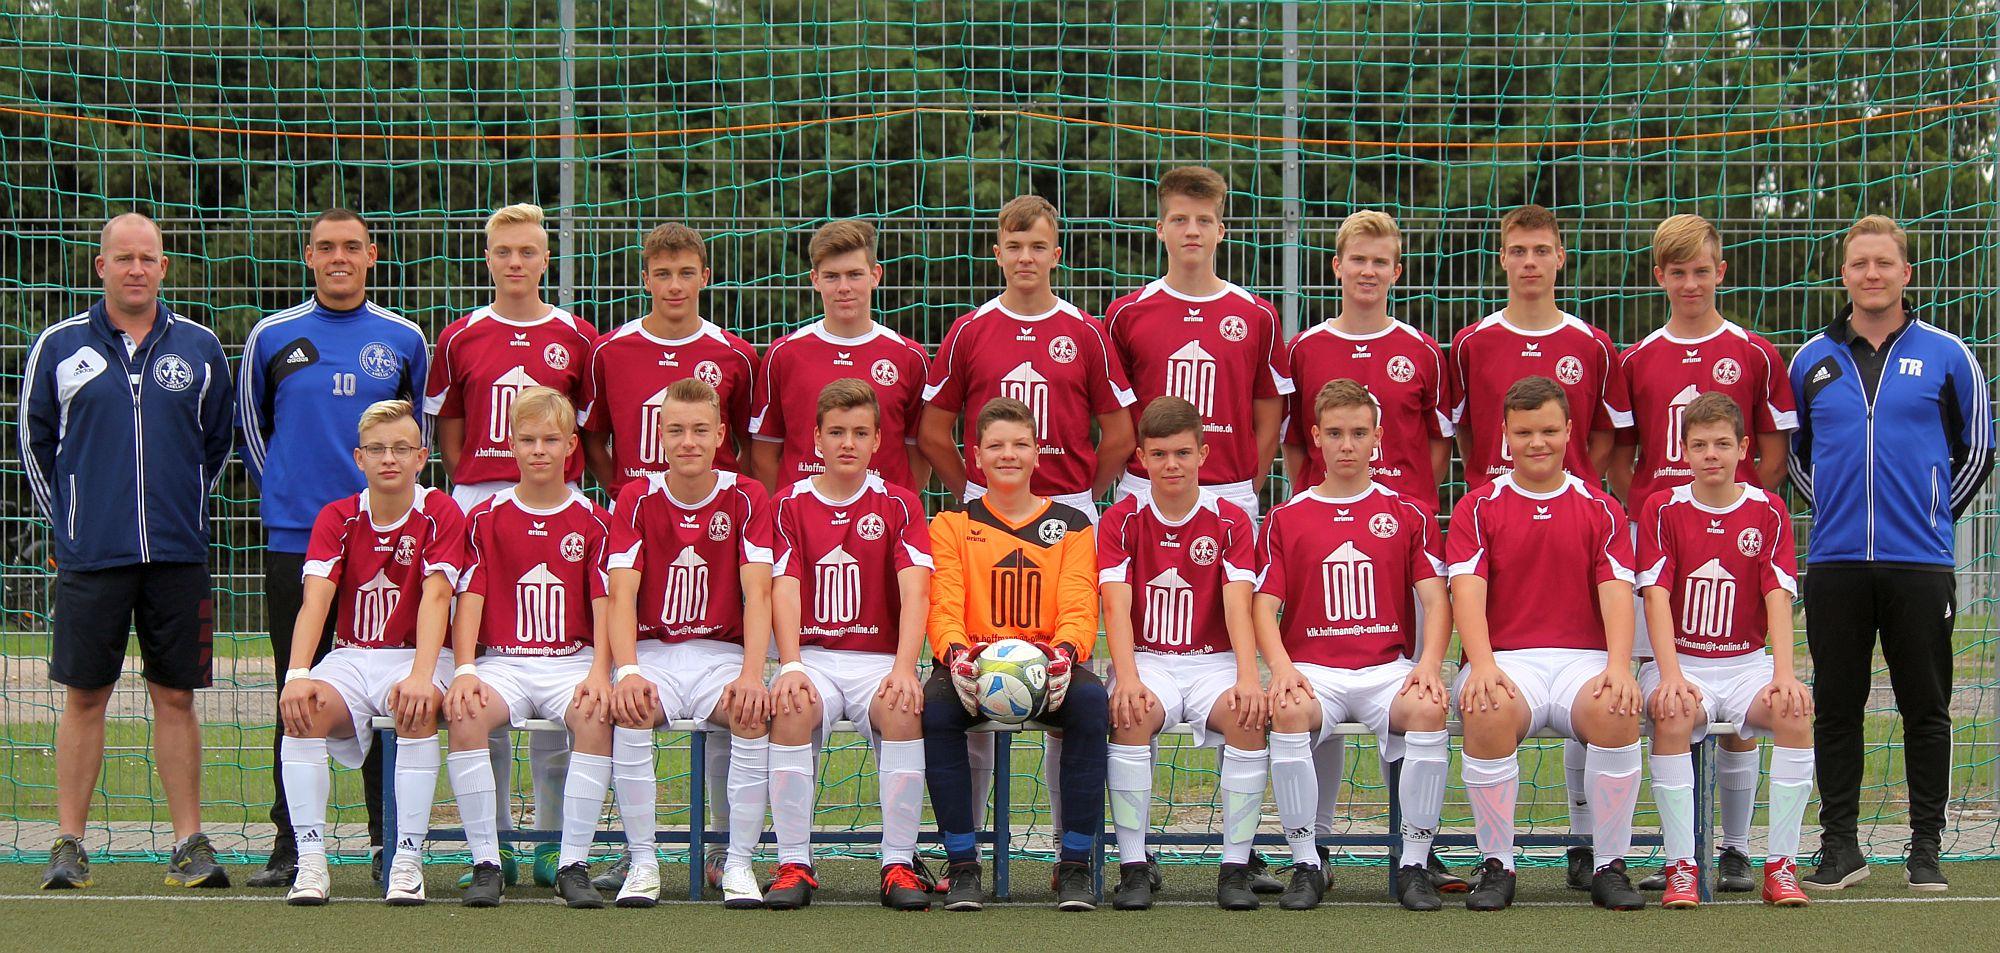 B-Junioren bezwingen Krusenfelde mit 12:0